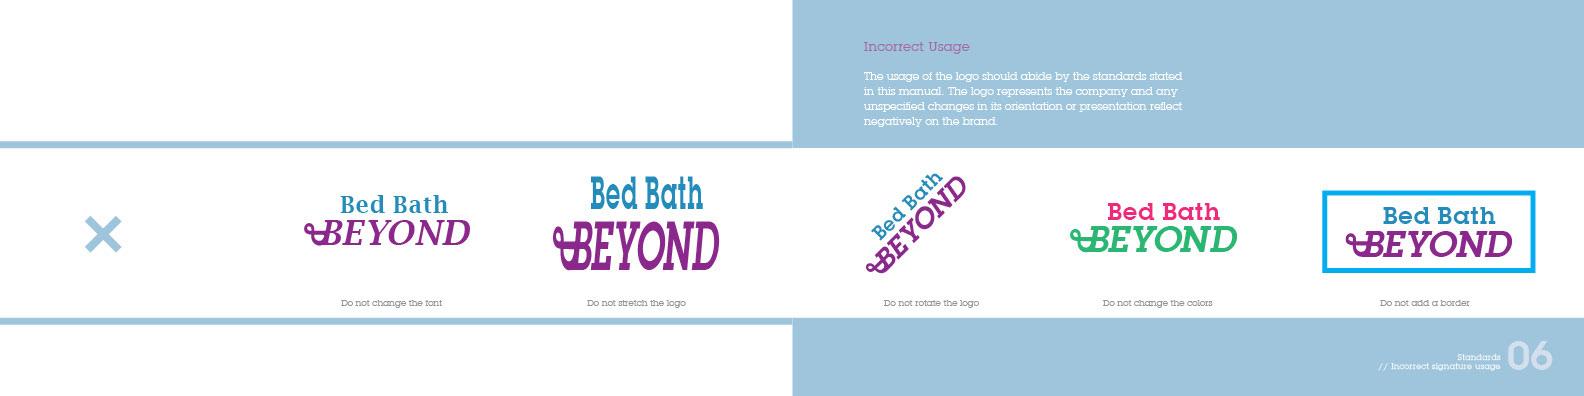 bed bath beyond capital structure decision Harris, milton and artur raviv 2010 control of corporate decisions: shareholders vs management bed bath & beyond: the capital structure decision.